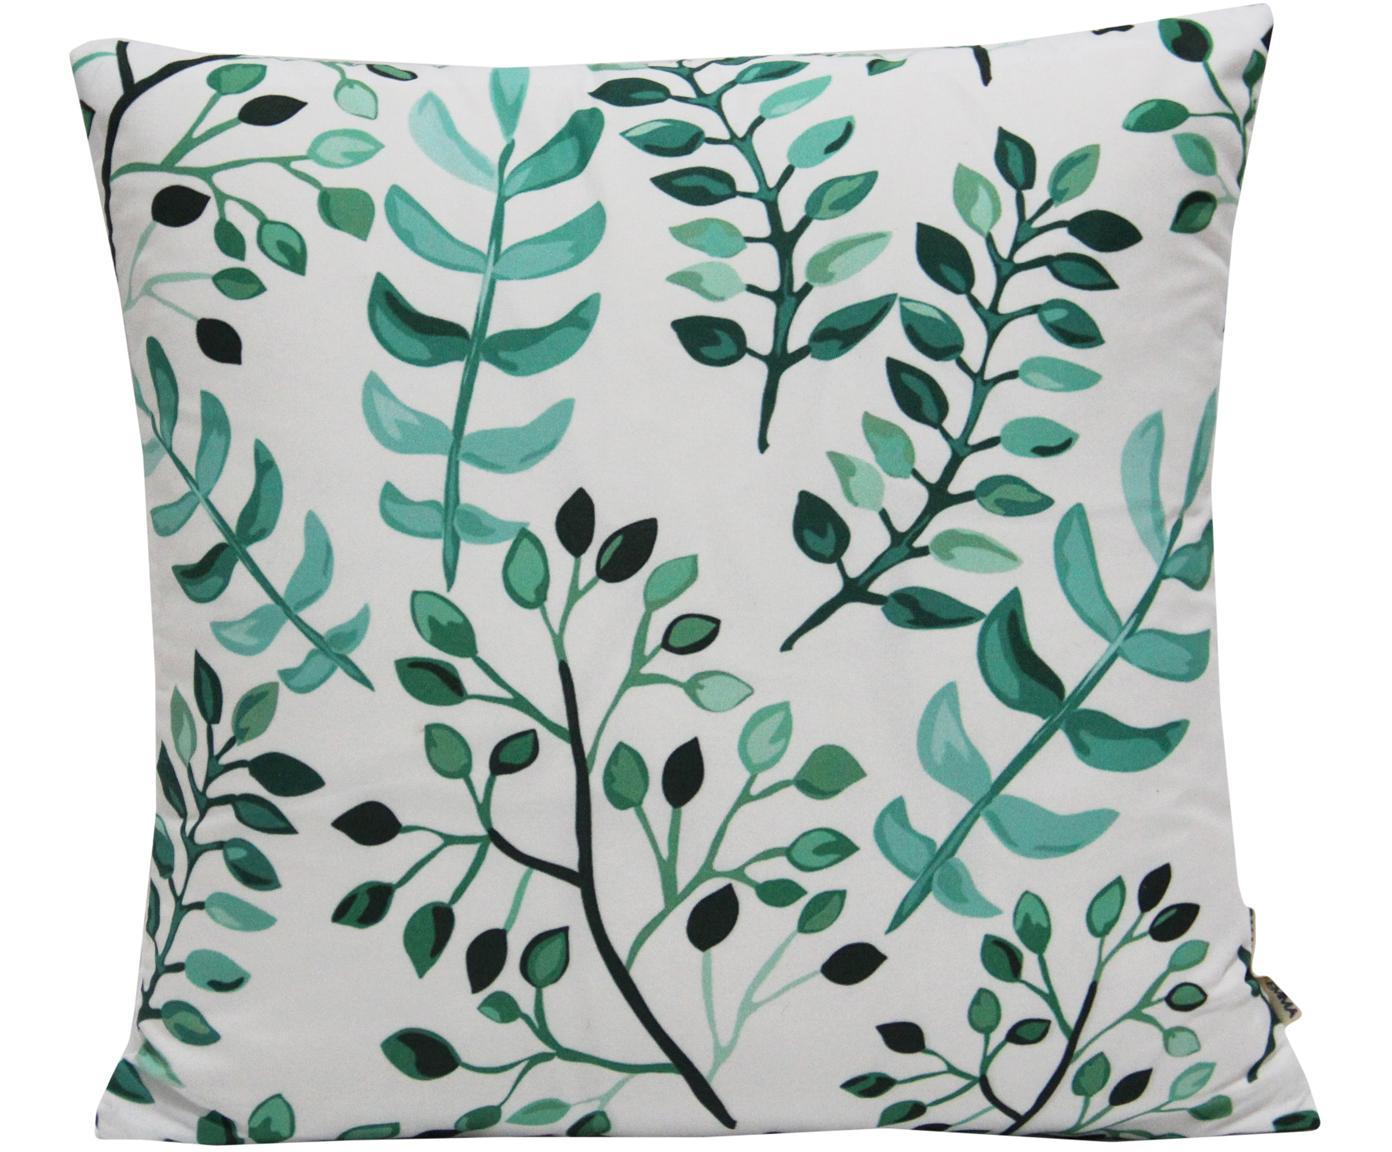 Kissenhülle Leaves mit Blattmuster, 100% Polyester, Weiss, Grüntöne, 40 x 40 cm